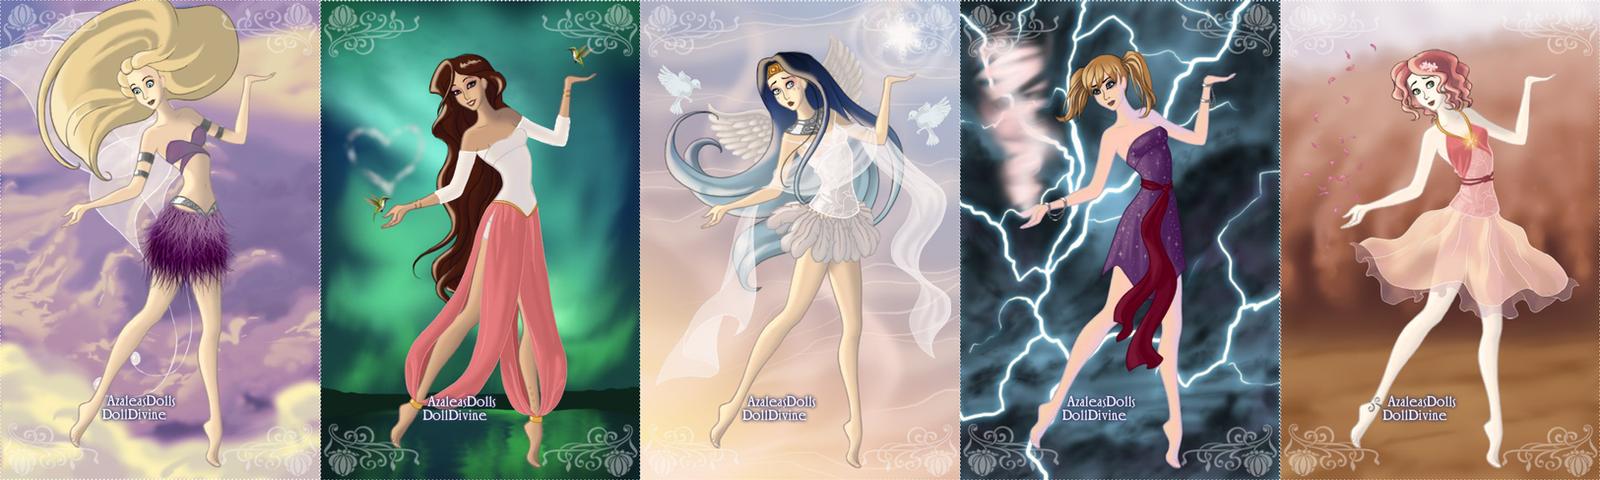 Naruto Girls: Air by Sasuke4Tenten